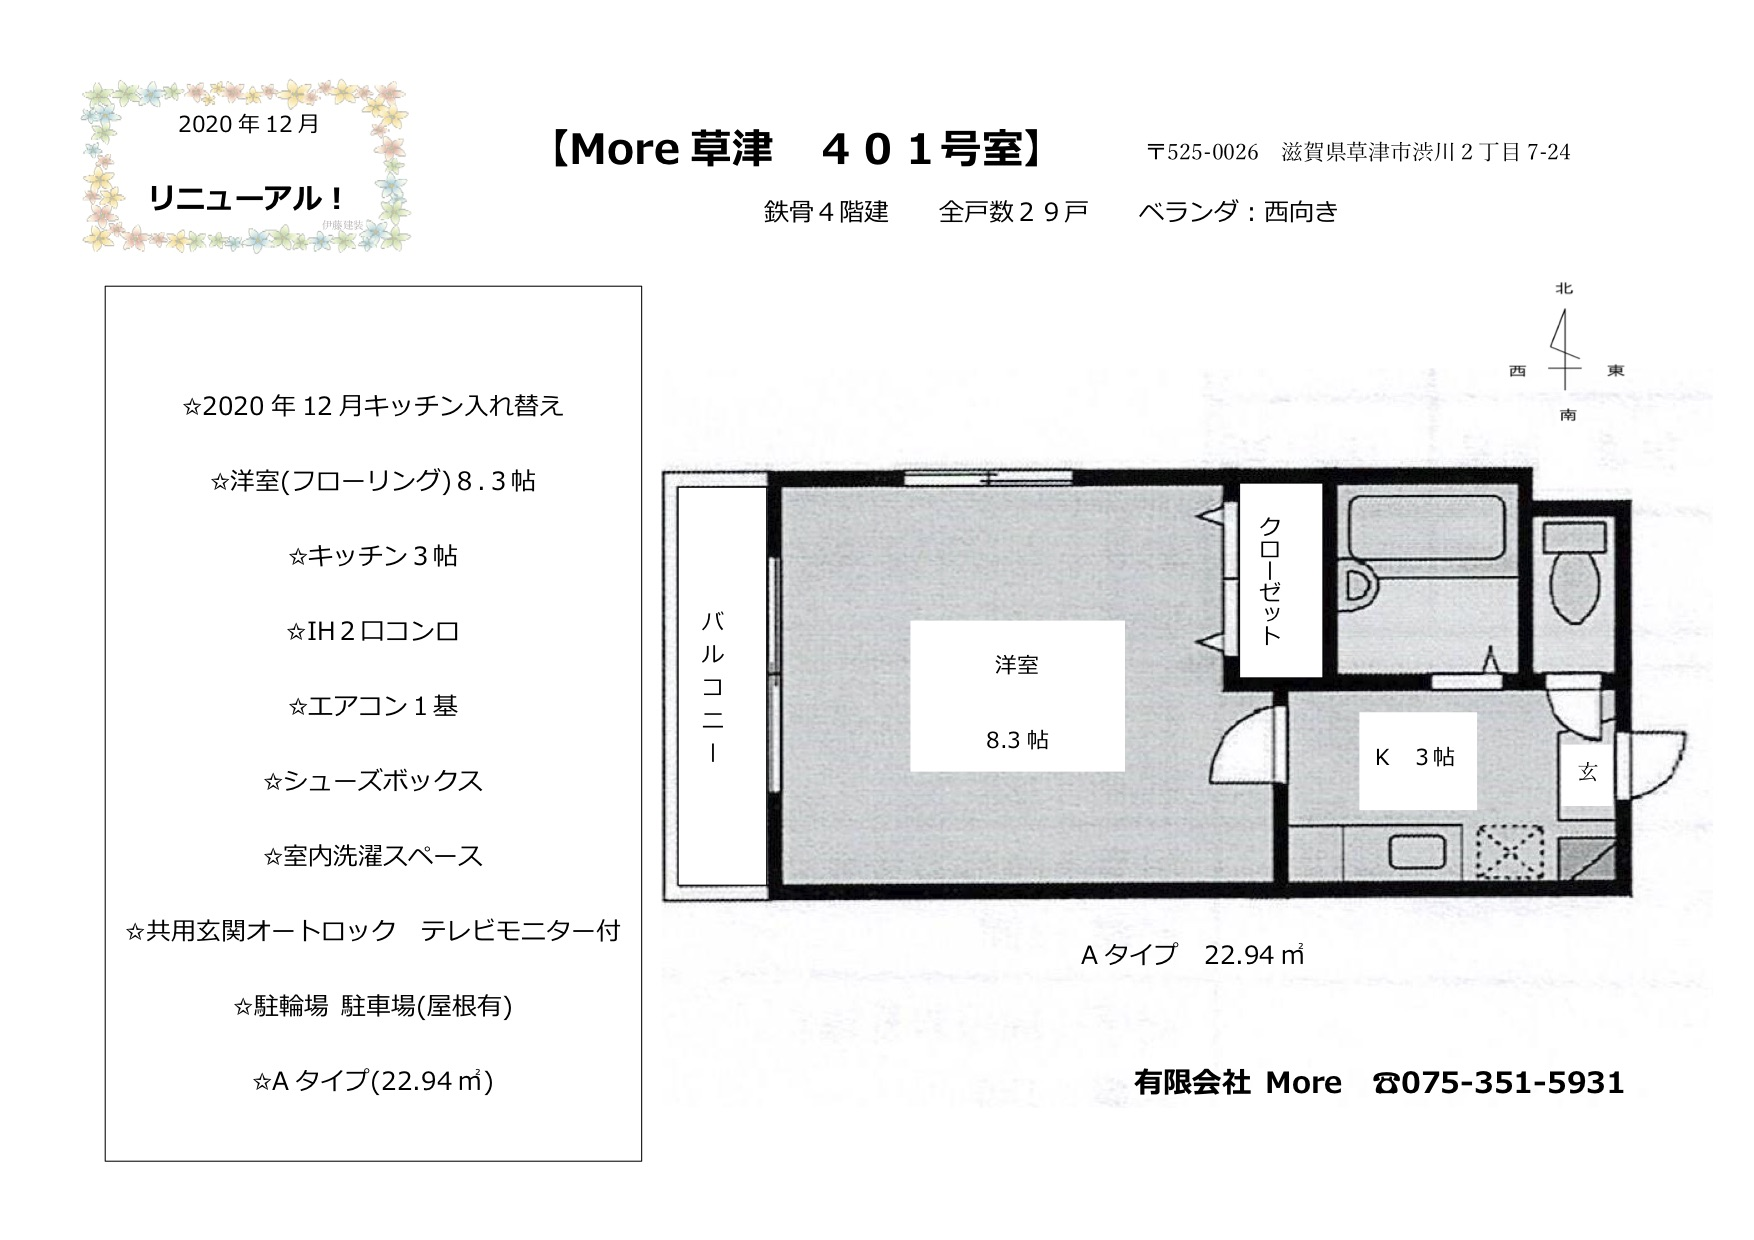 More草津 401号